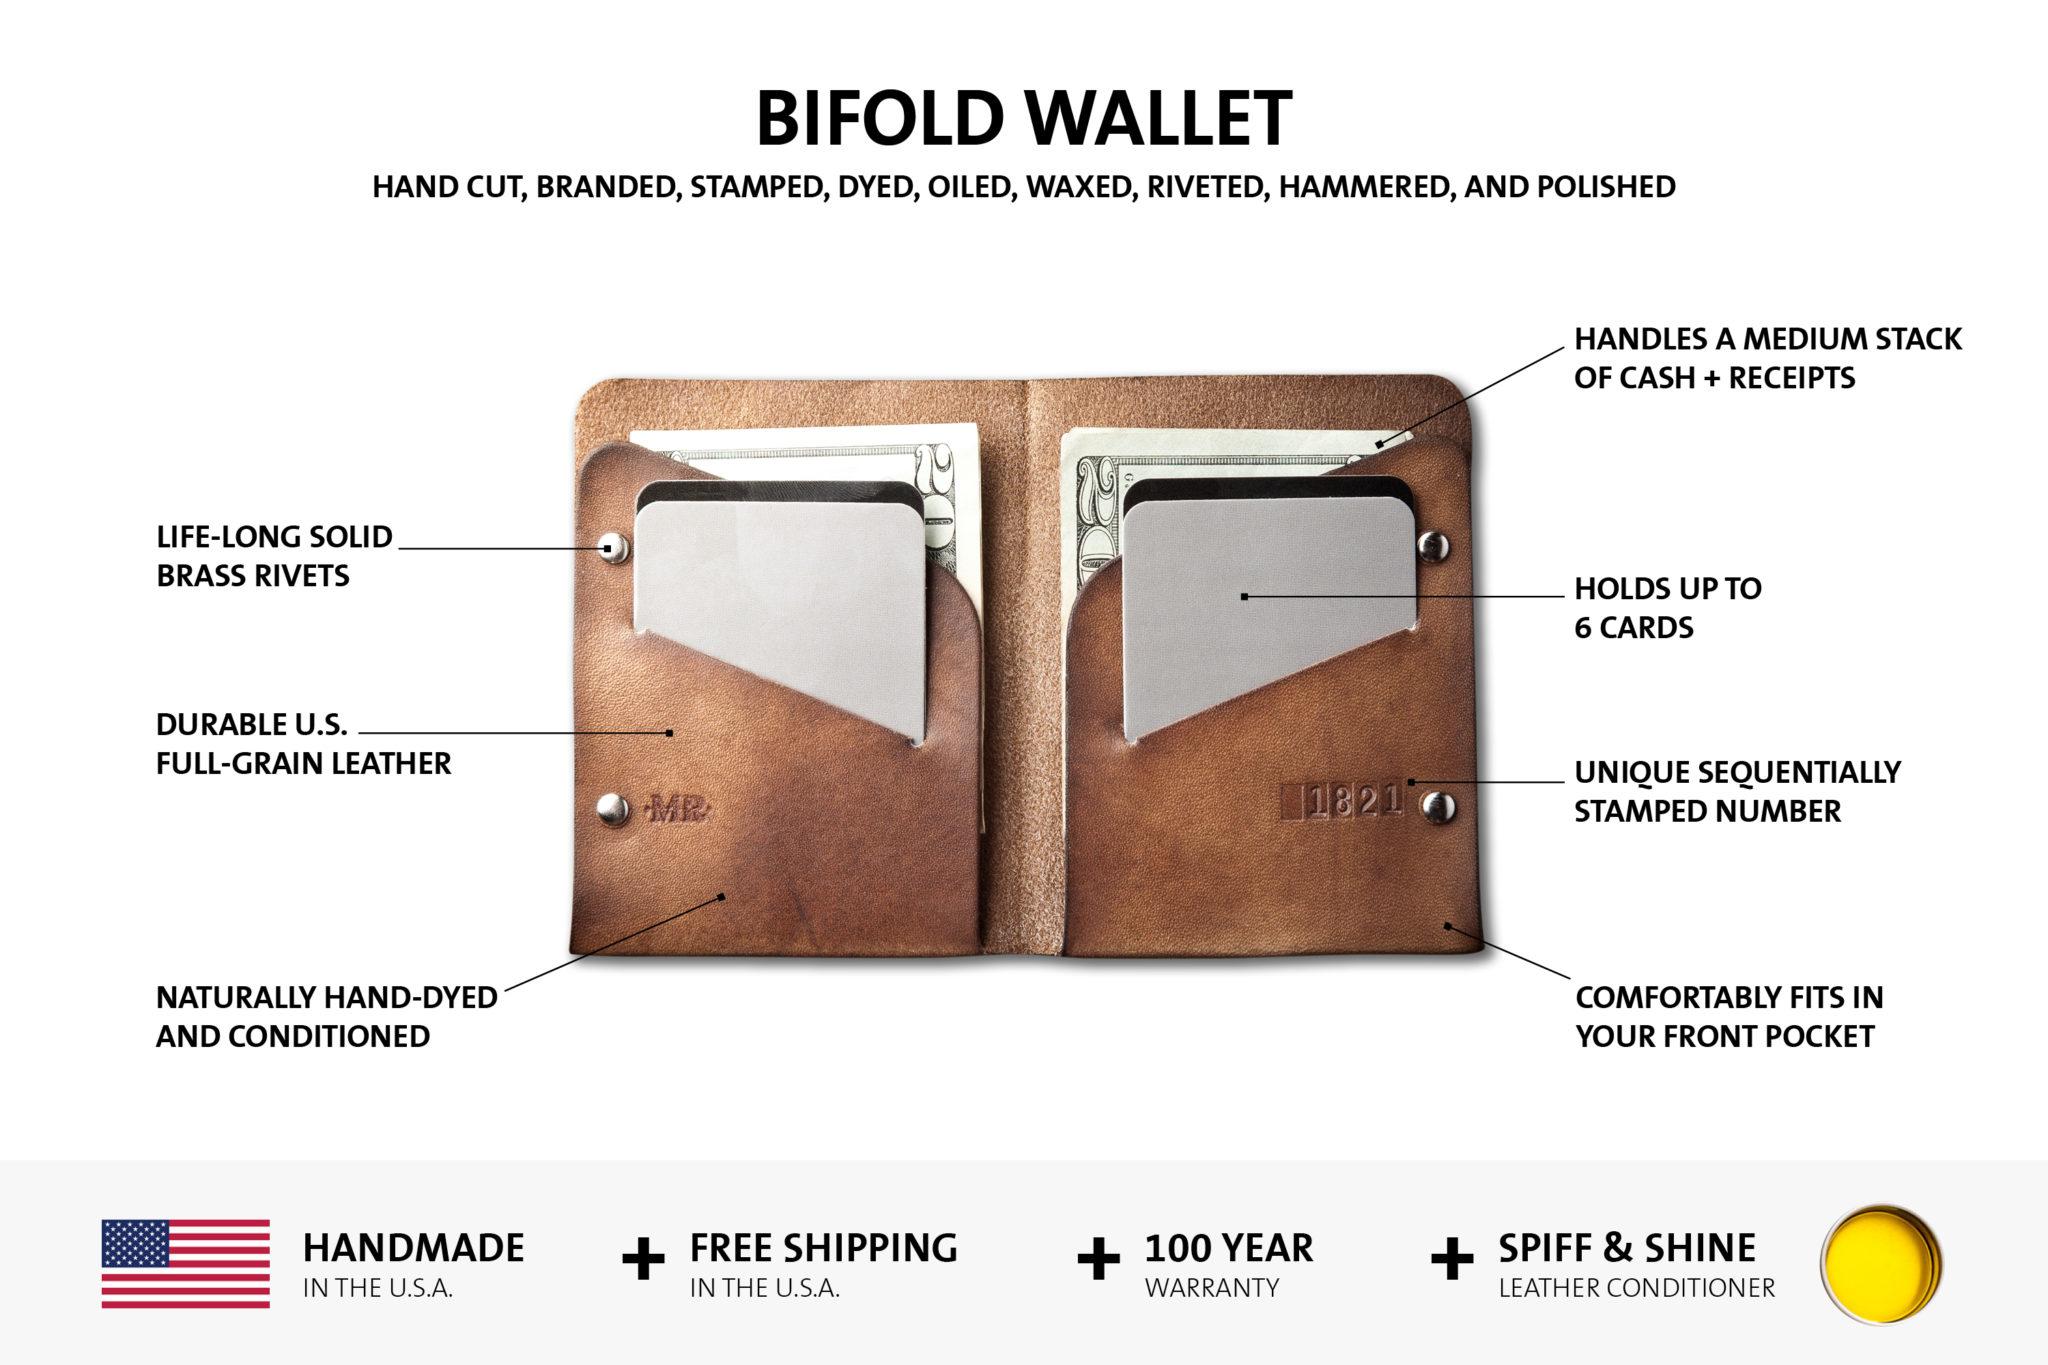 slim leather wallet benefits